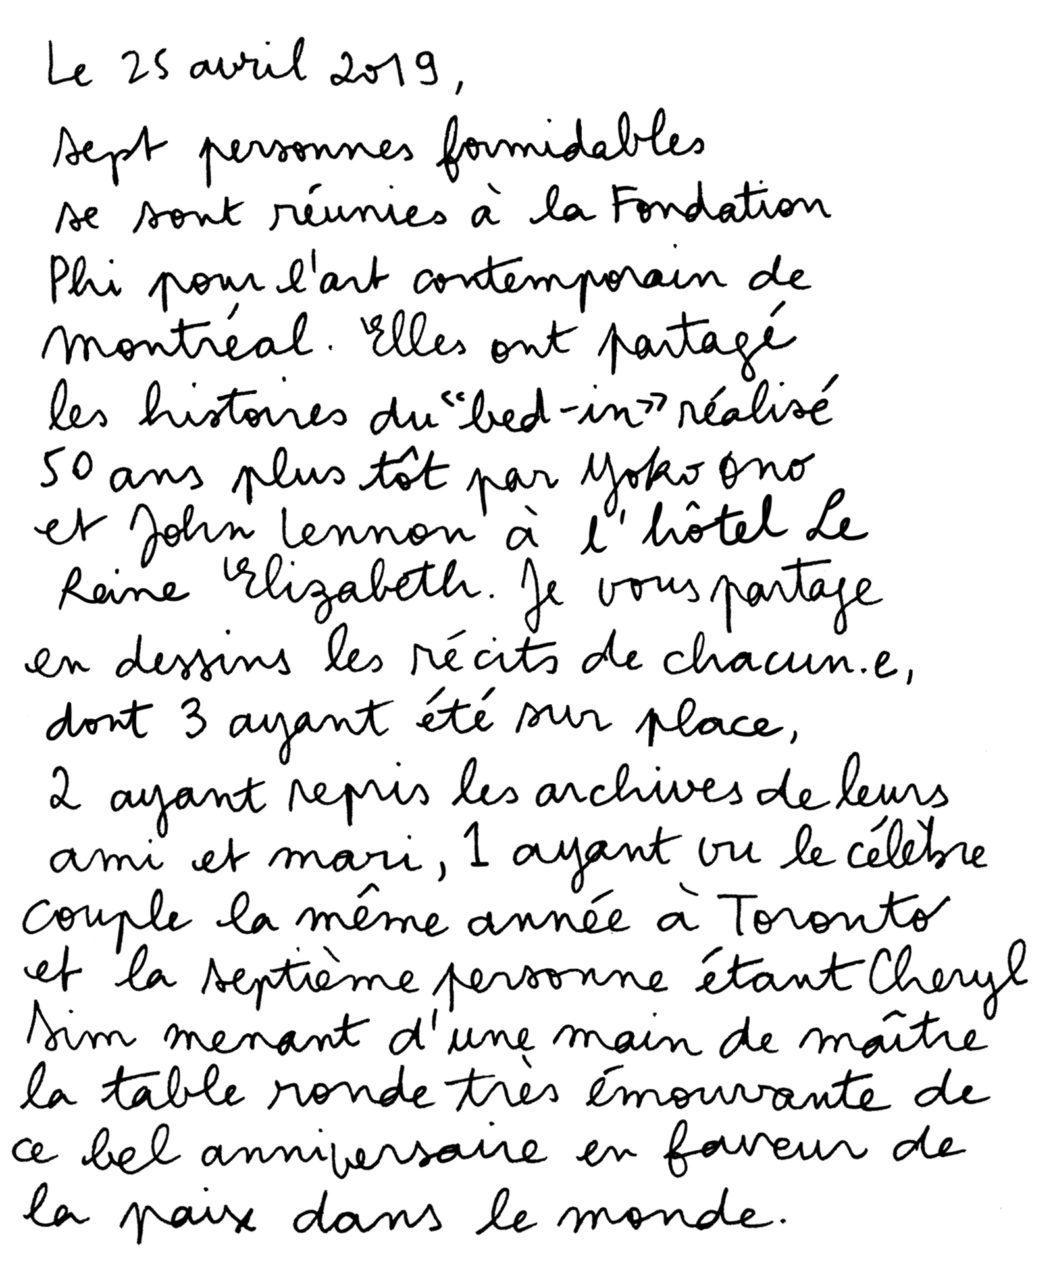 Yoko Ono et John Lennon: bed-in à Montreal - Texte